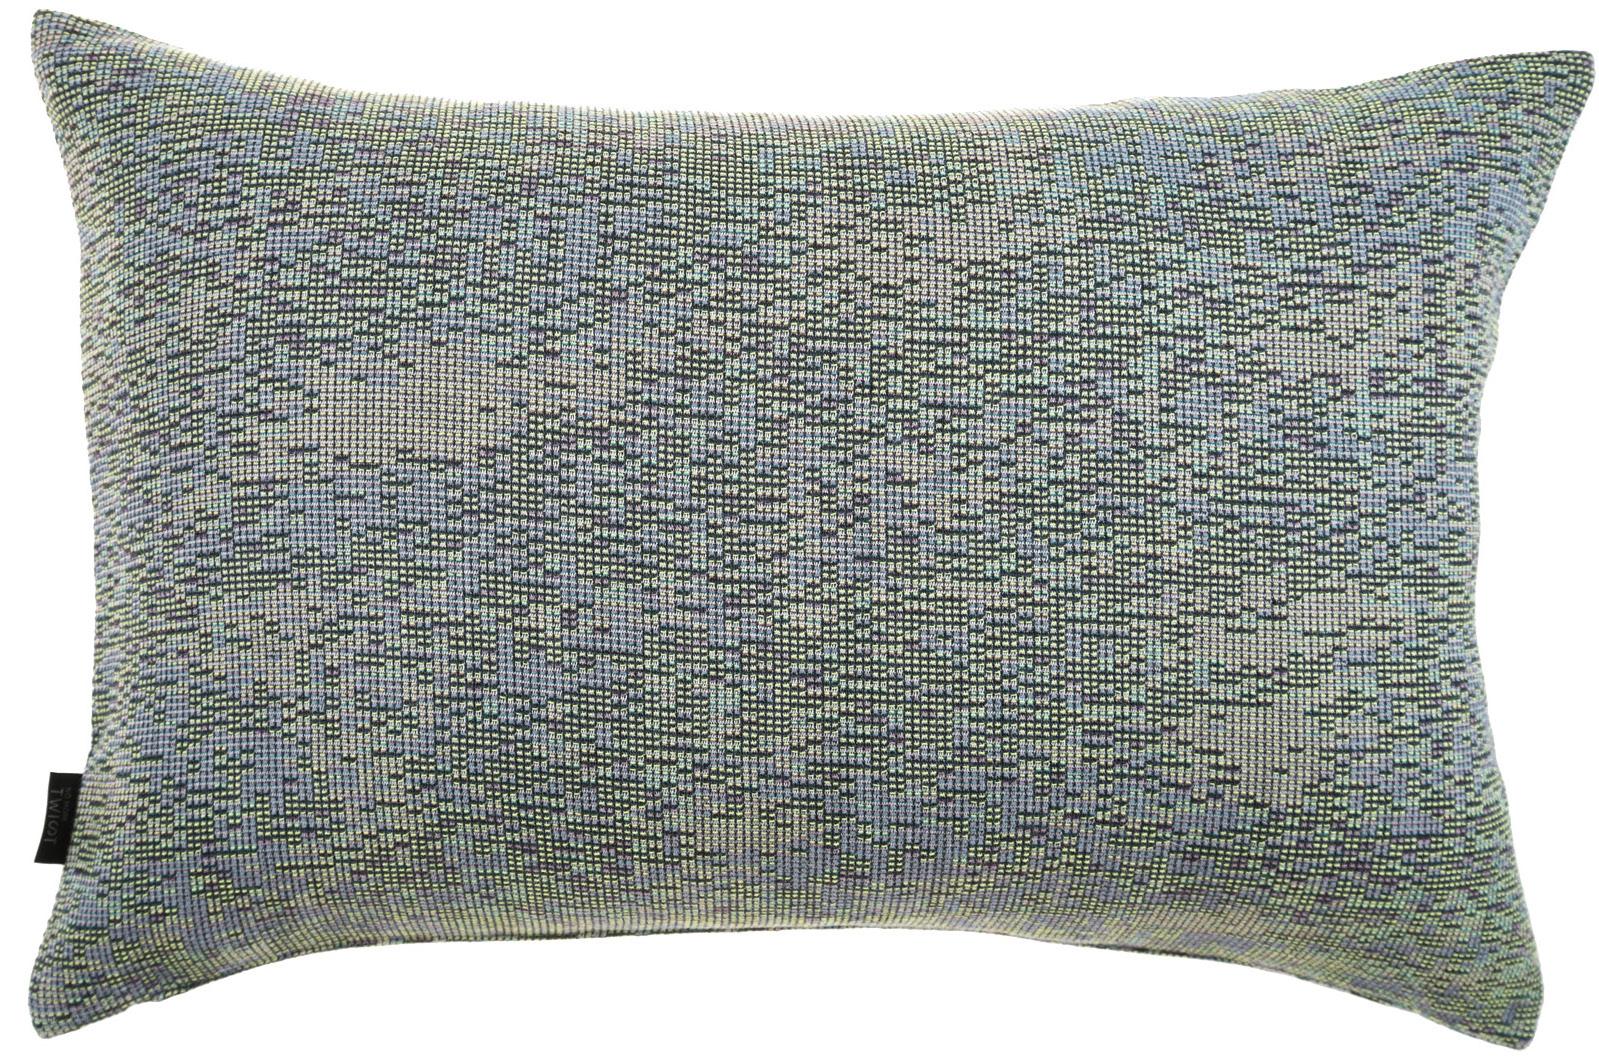 Reflet/ dark blue- cushion M ≅ 44 x 69 cm  Composition: woven jacquard 78% wool 16% viscose 6% silk